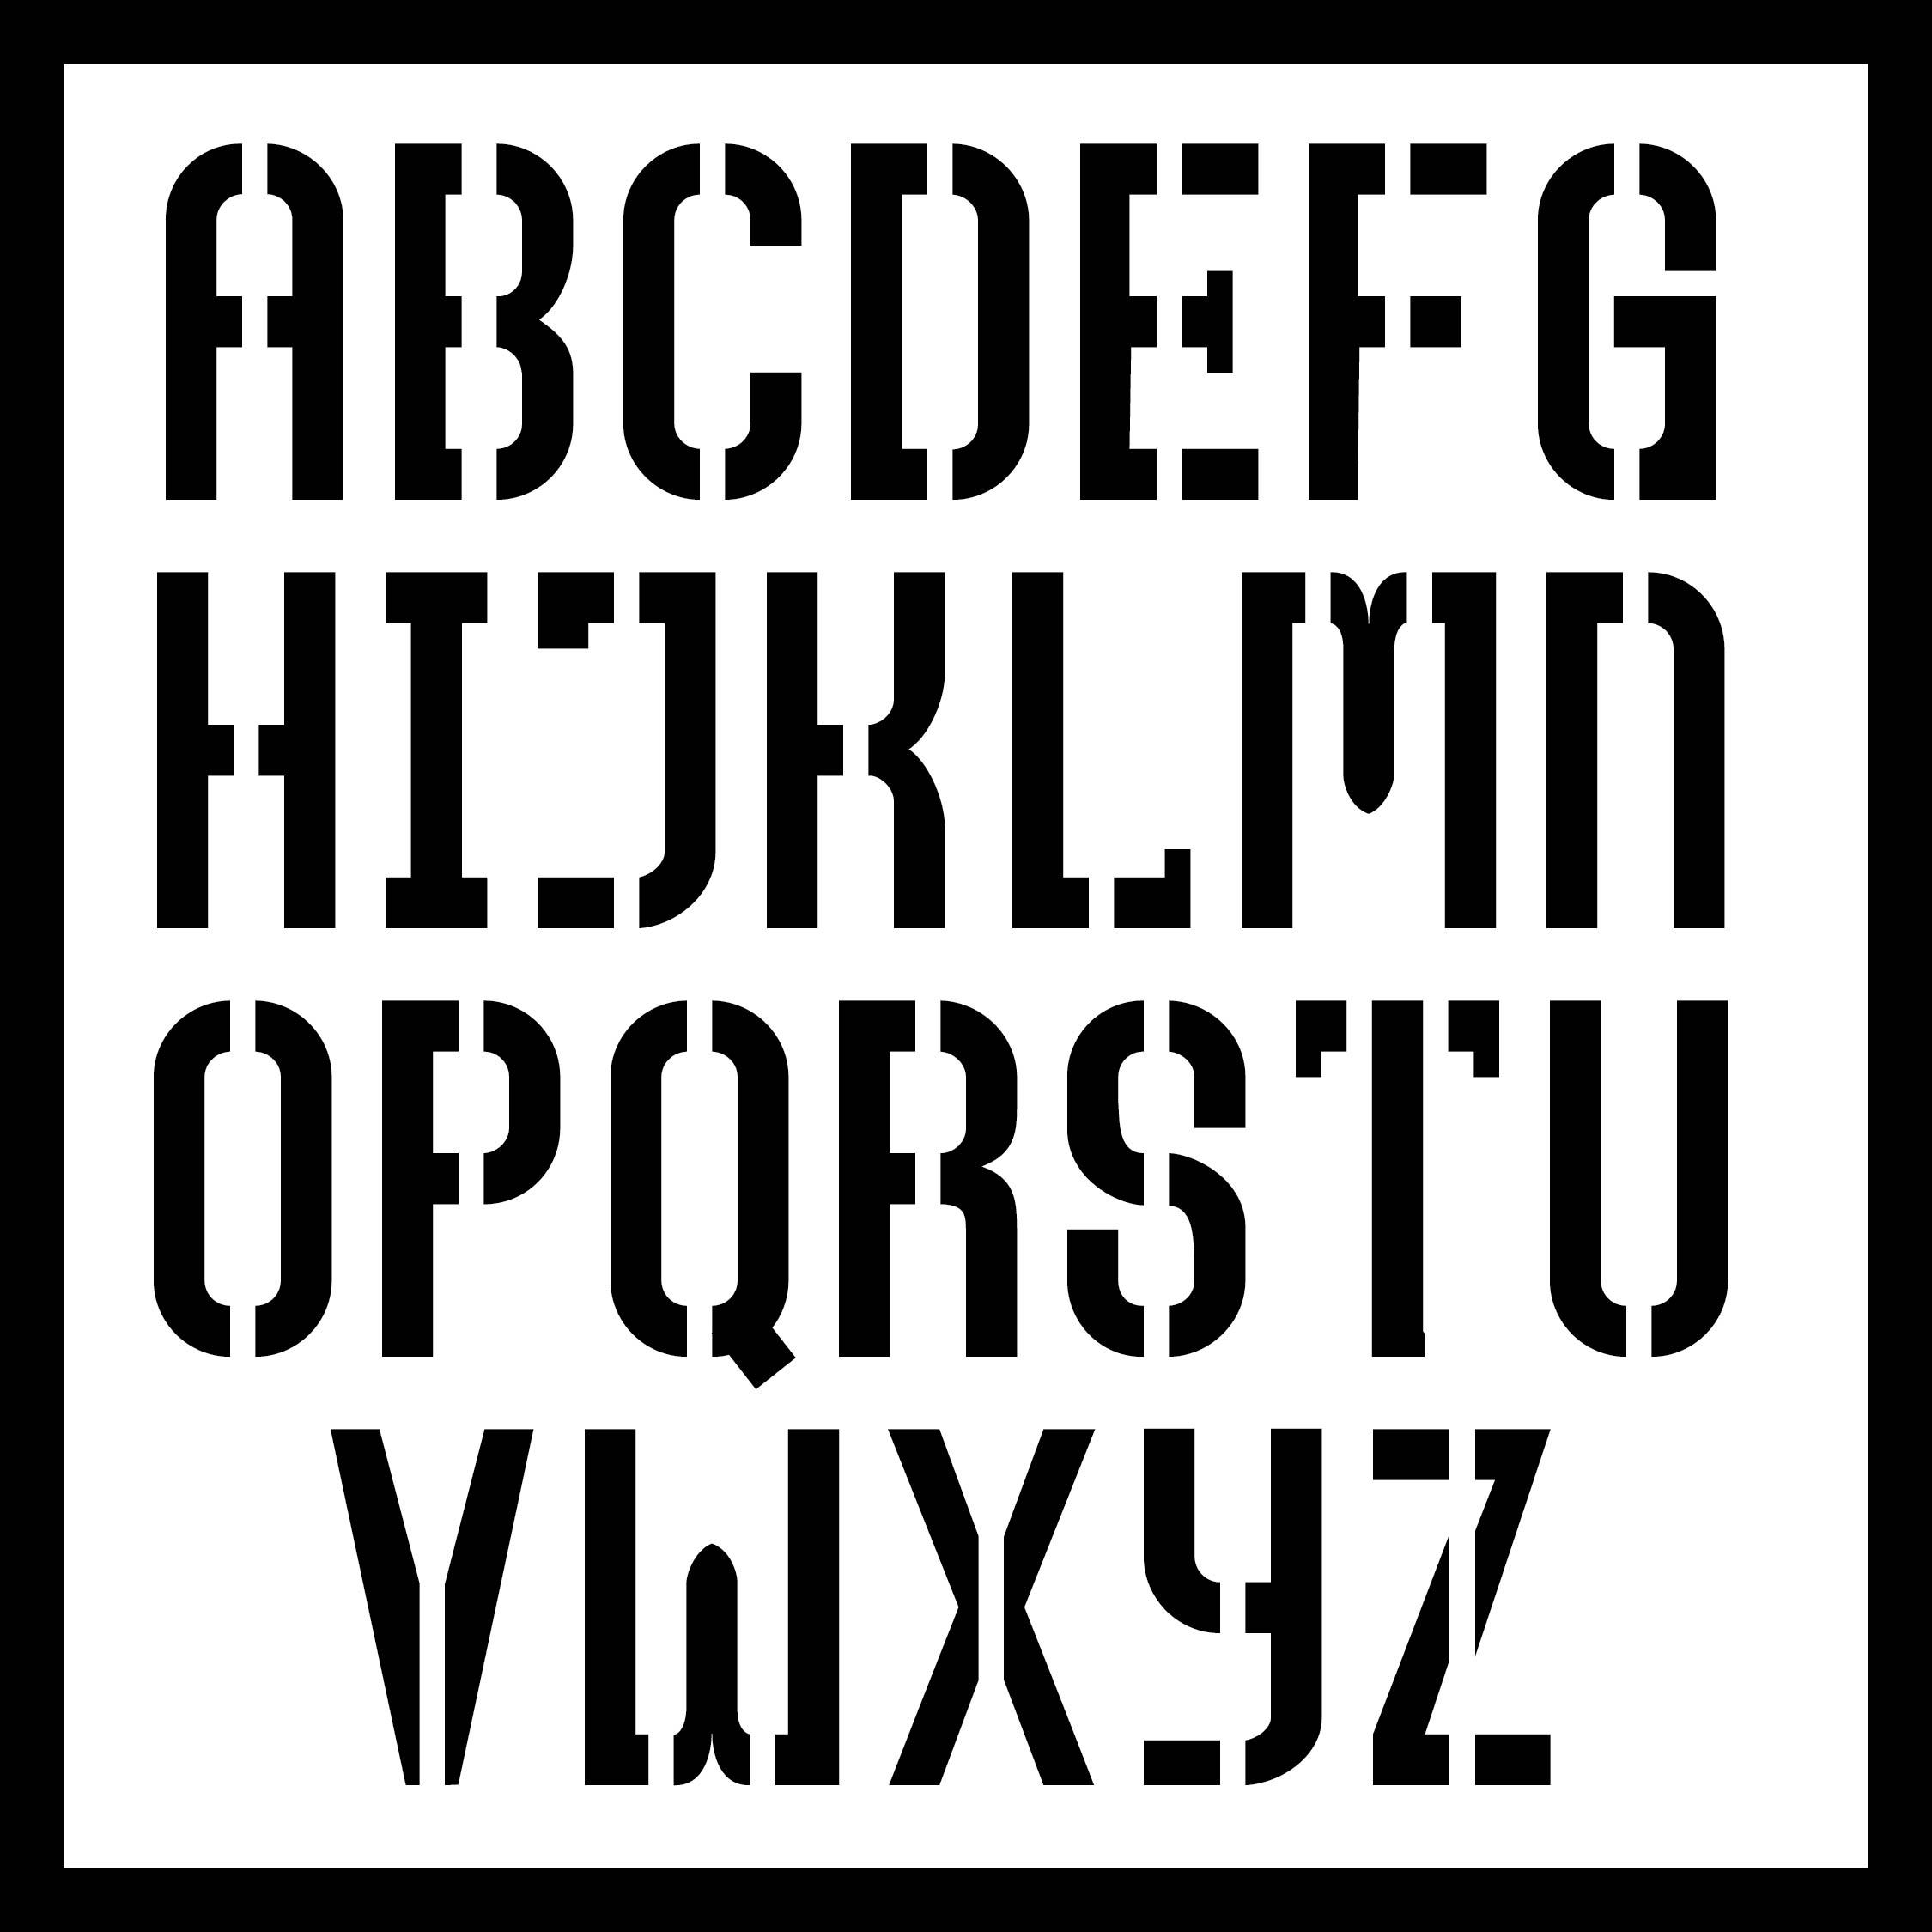 Printable 6 Inch Letter Stencil